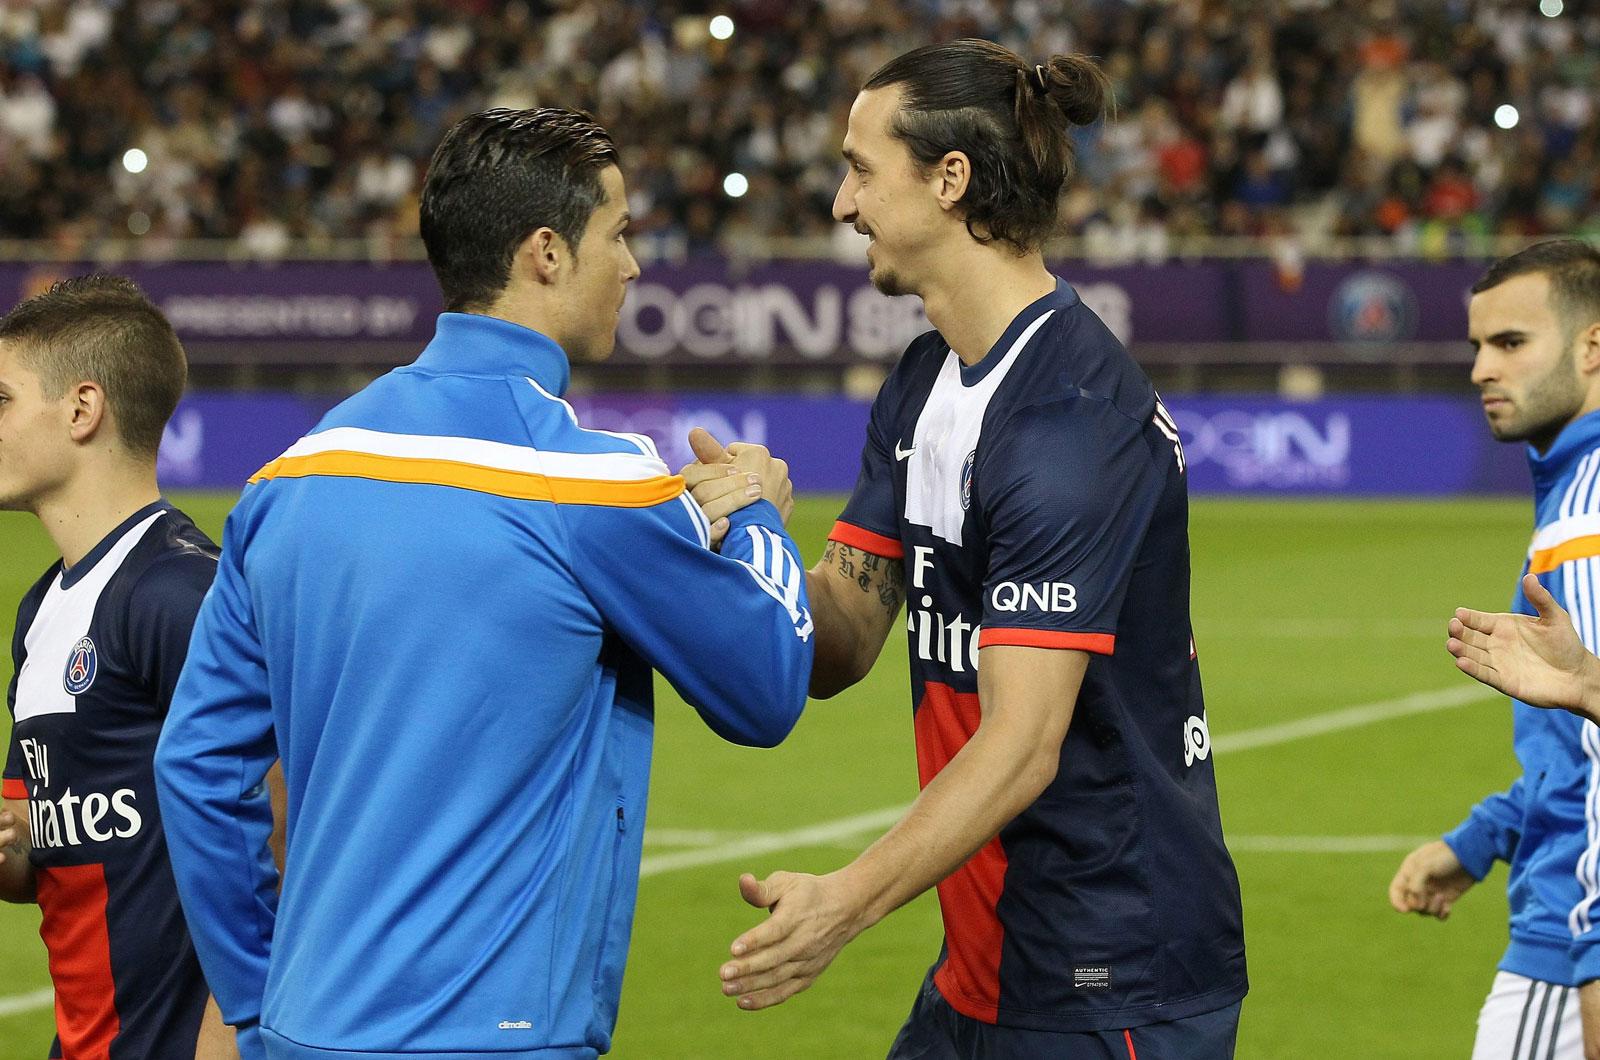 LDC - Cristiano Ronaldo élu joueur de la semaine, Zlatan Ibrahimovic 2e